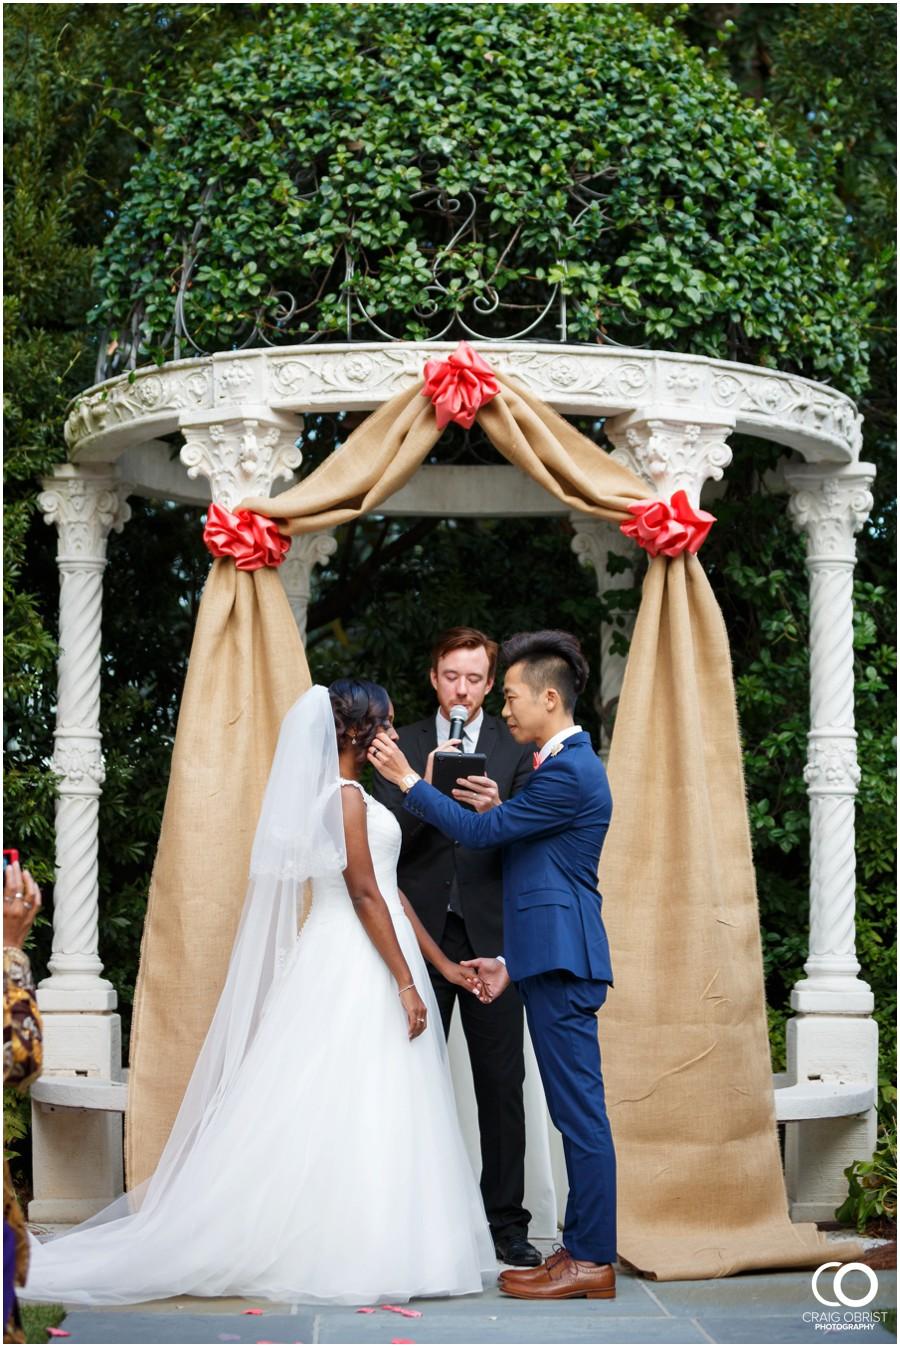 Atrium Norcross McDaniel Farm Park Wedding_0076.jpg